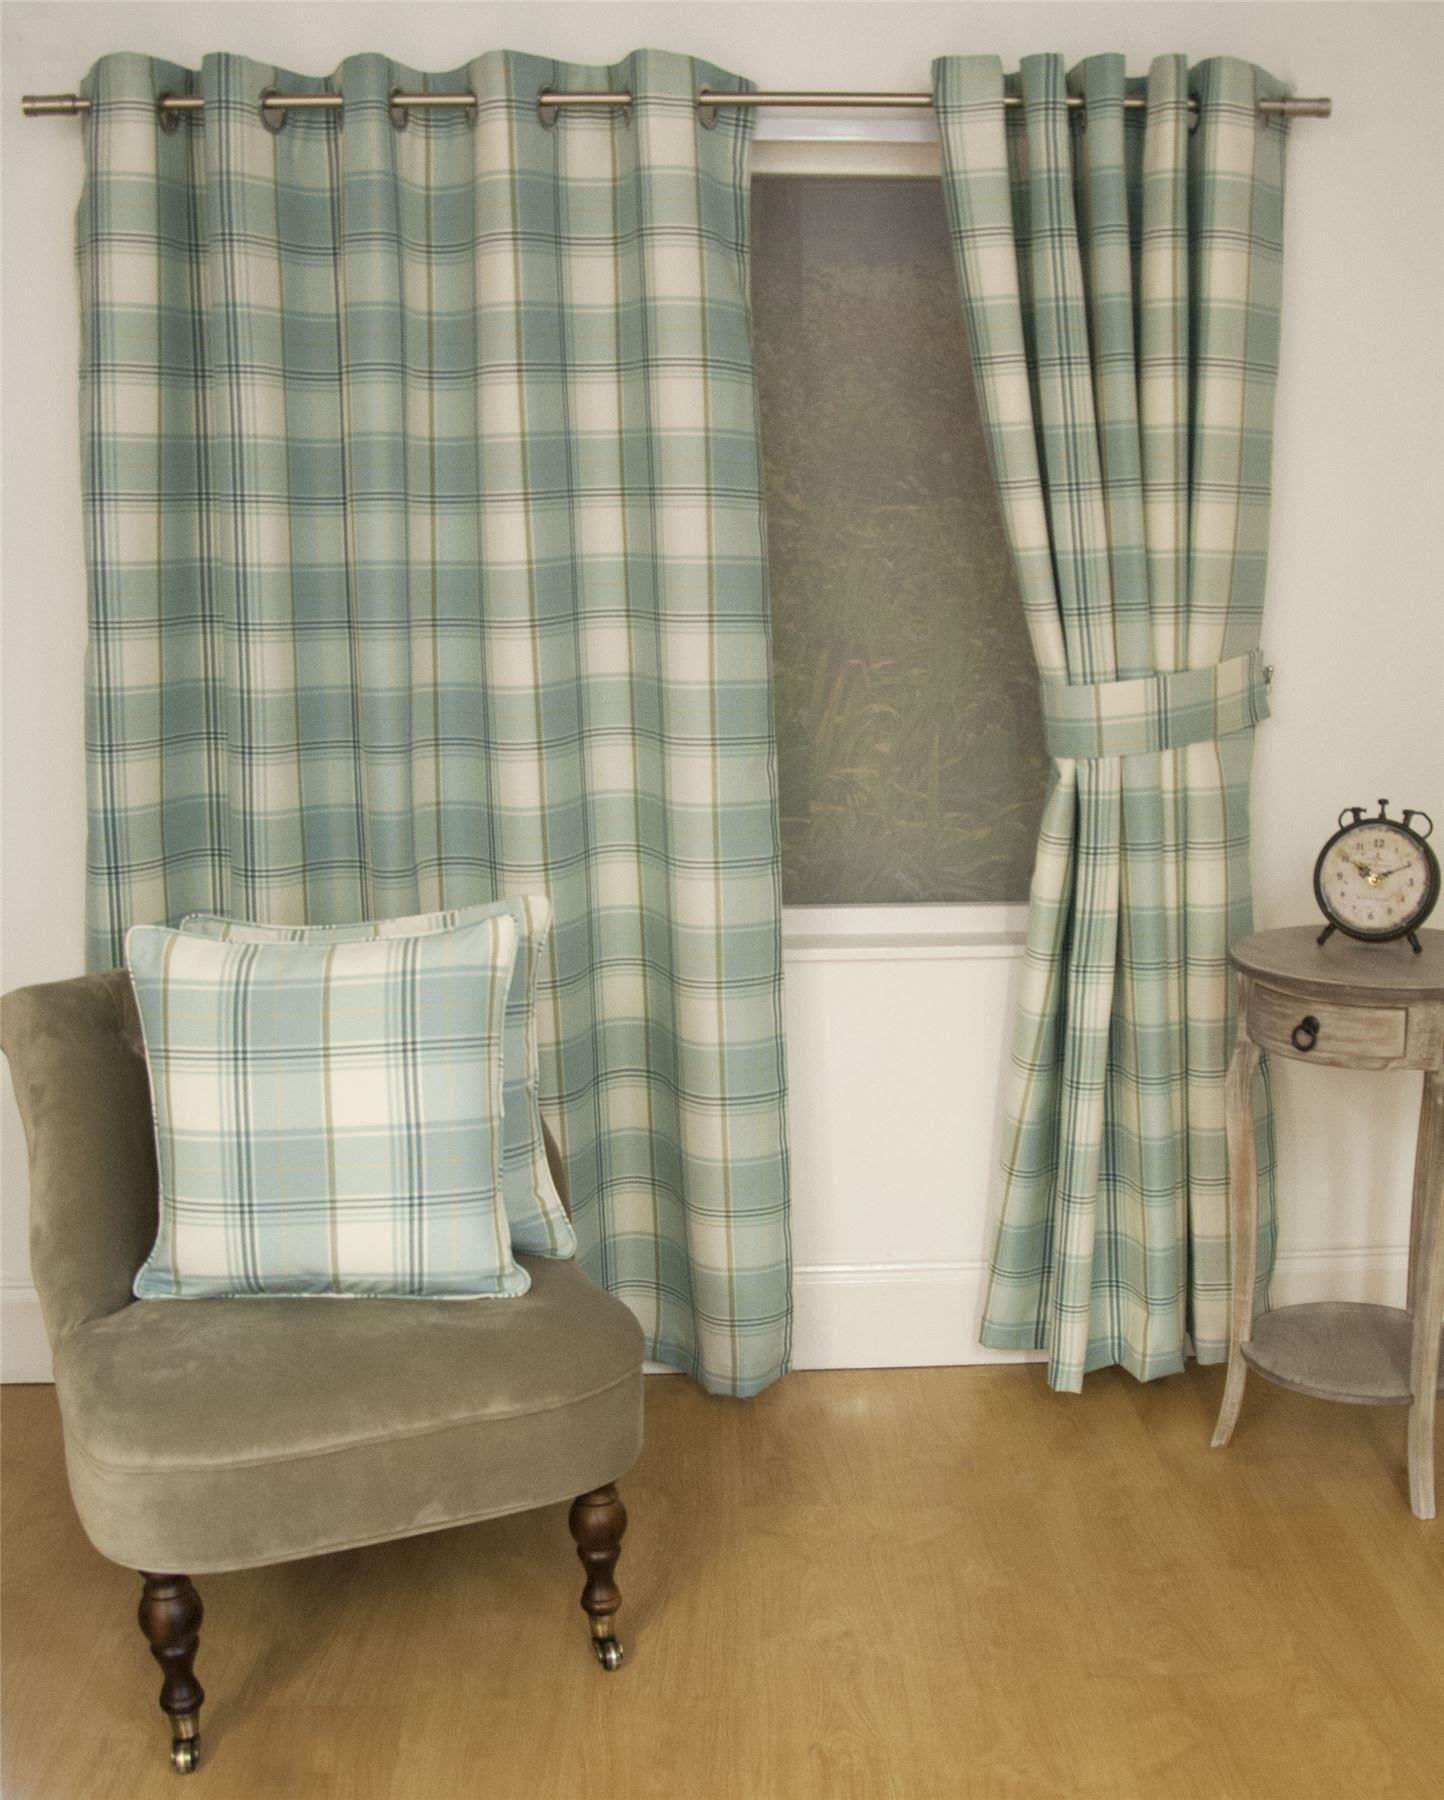 Cool JACQUARD-TARTAN-CHECK-DUCK-EGG-BLUE-LINED-RING- duck egg tartan curtains